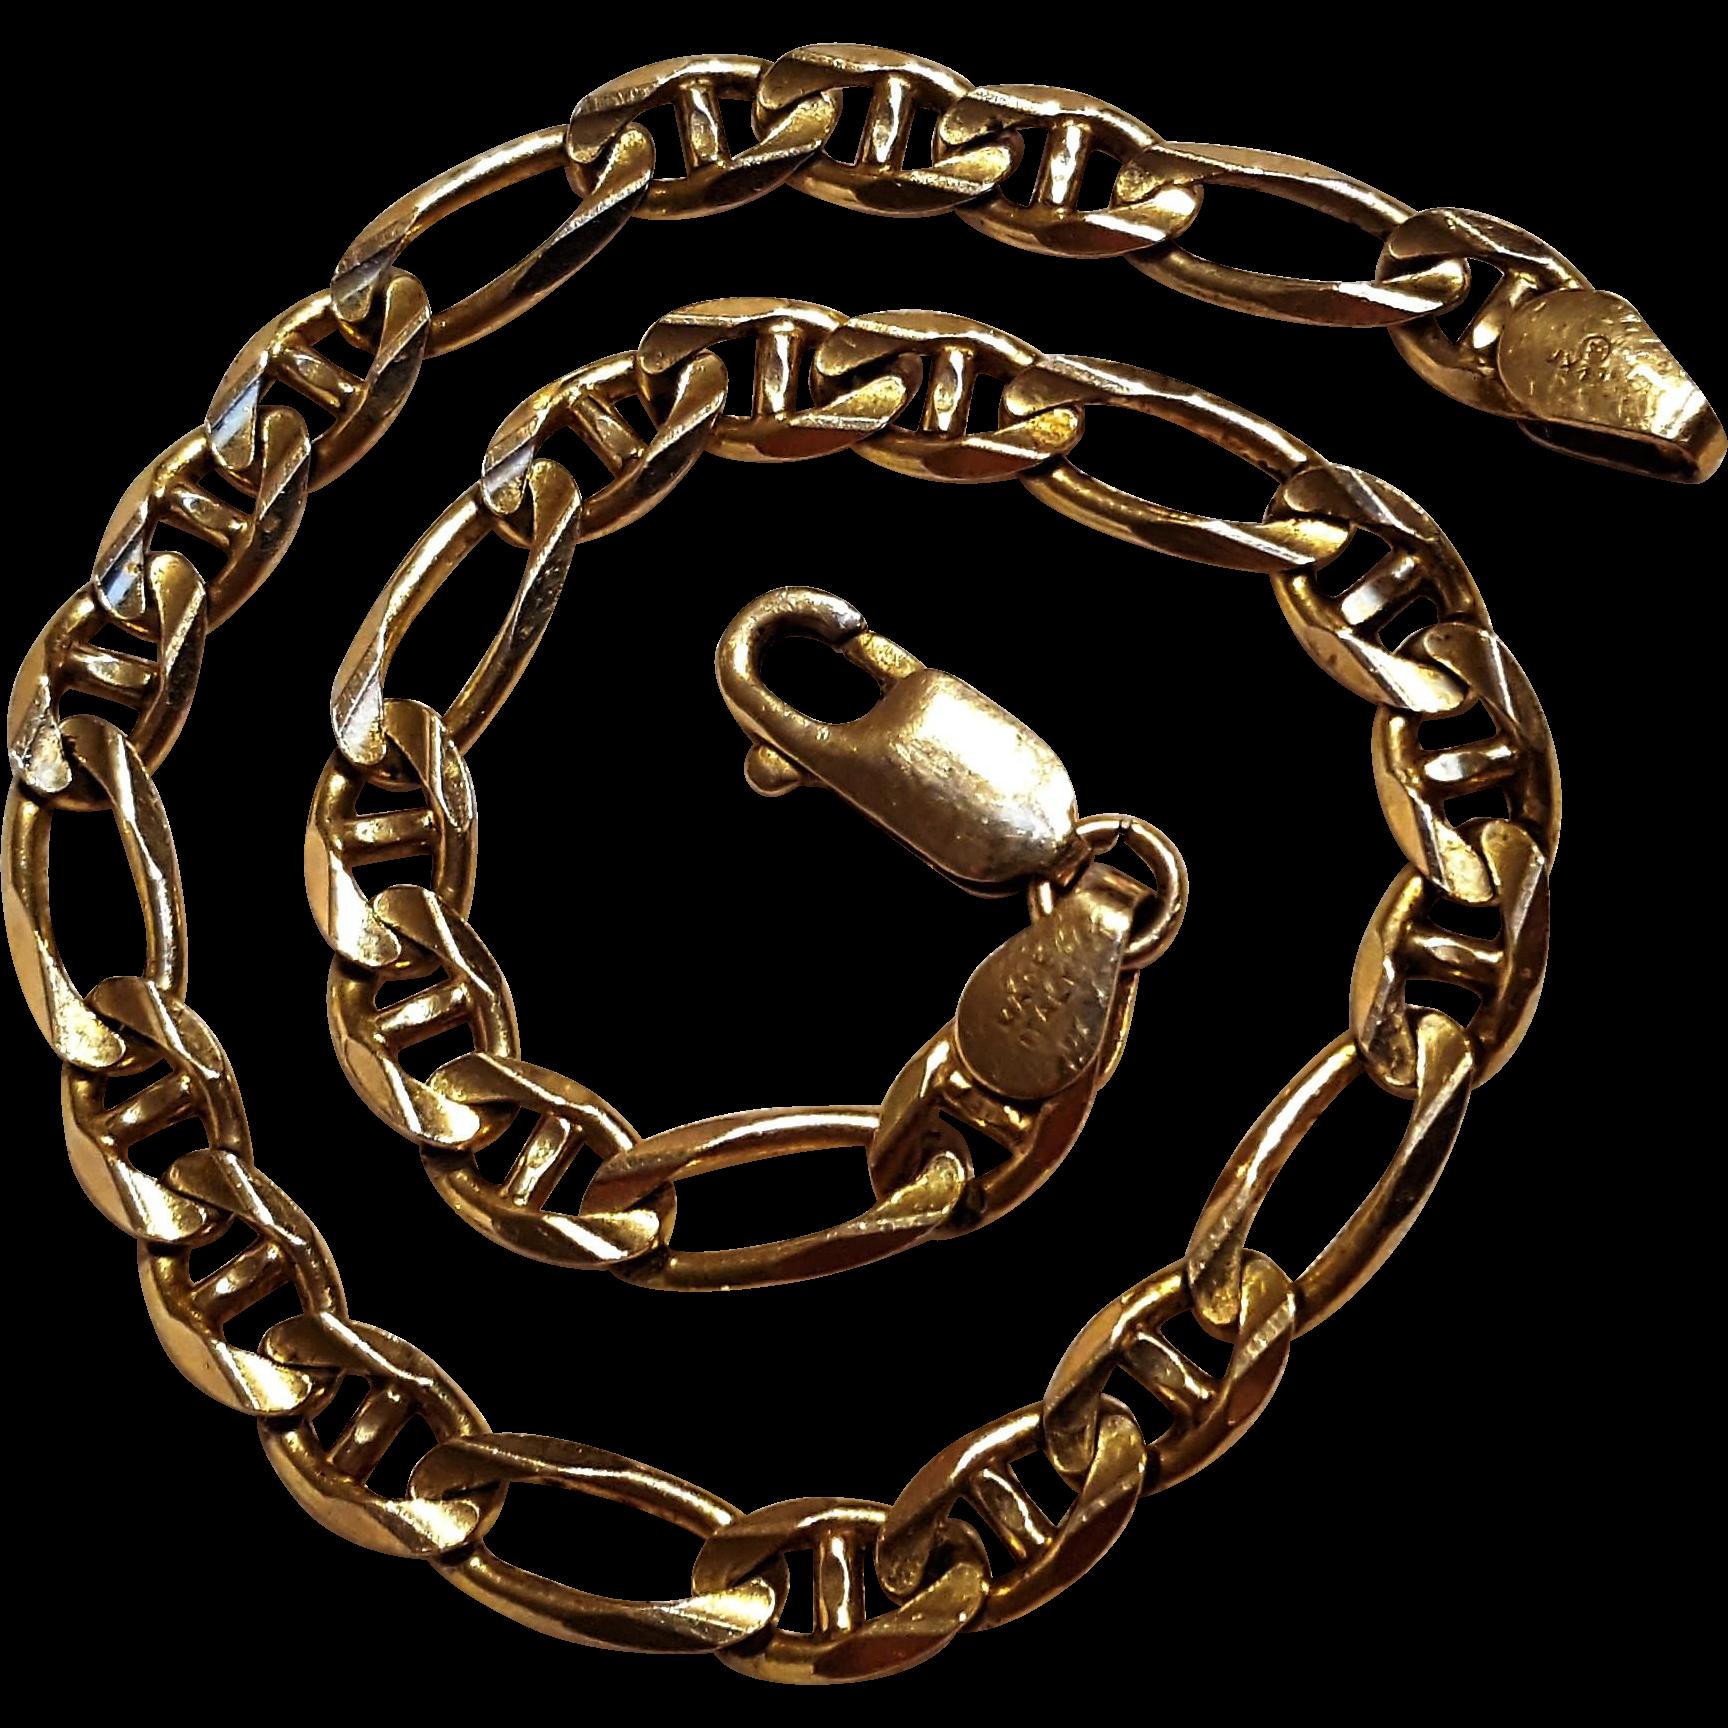 14K Gold bracelet Italy 7.2 grams